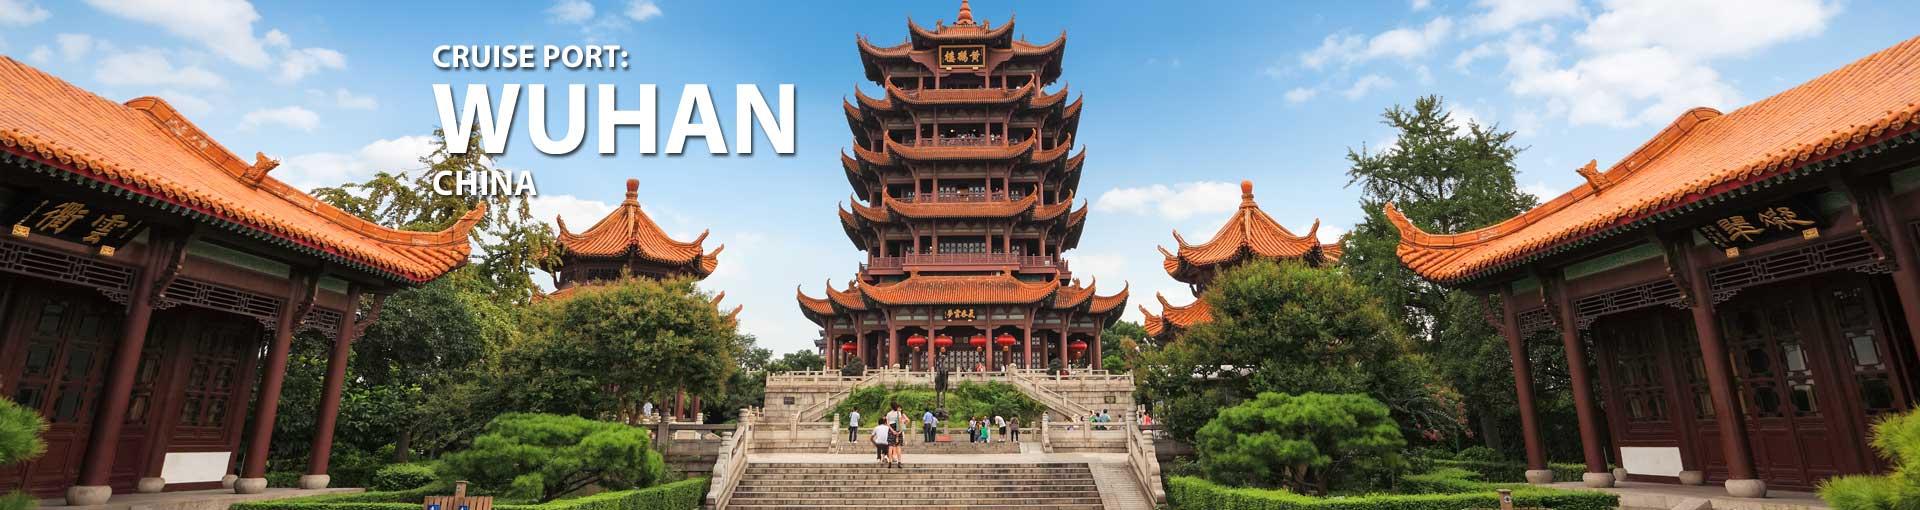 Cruises to Wuhan, China